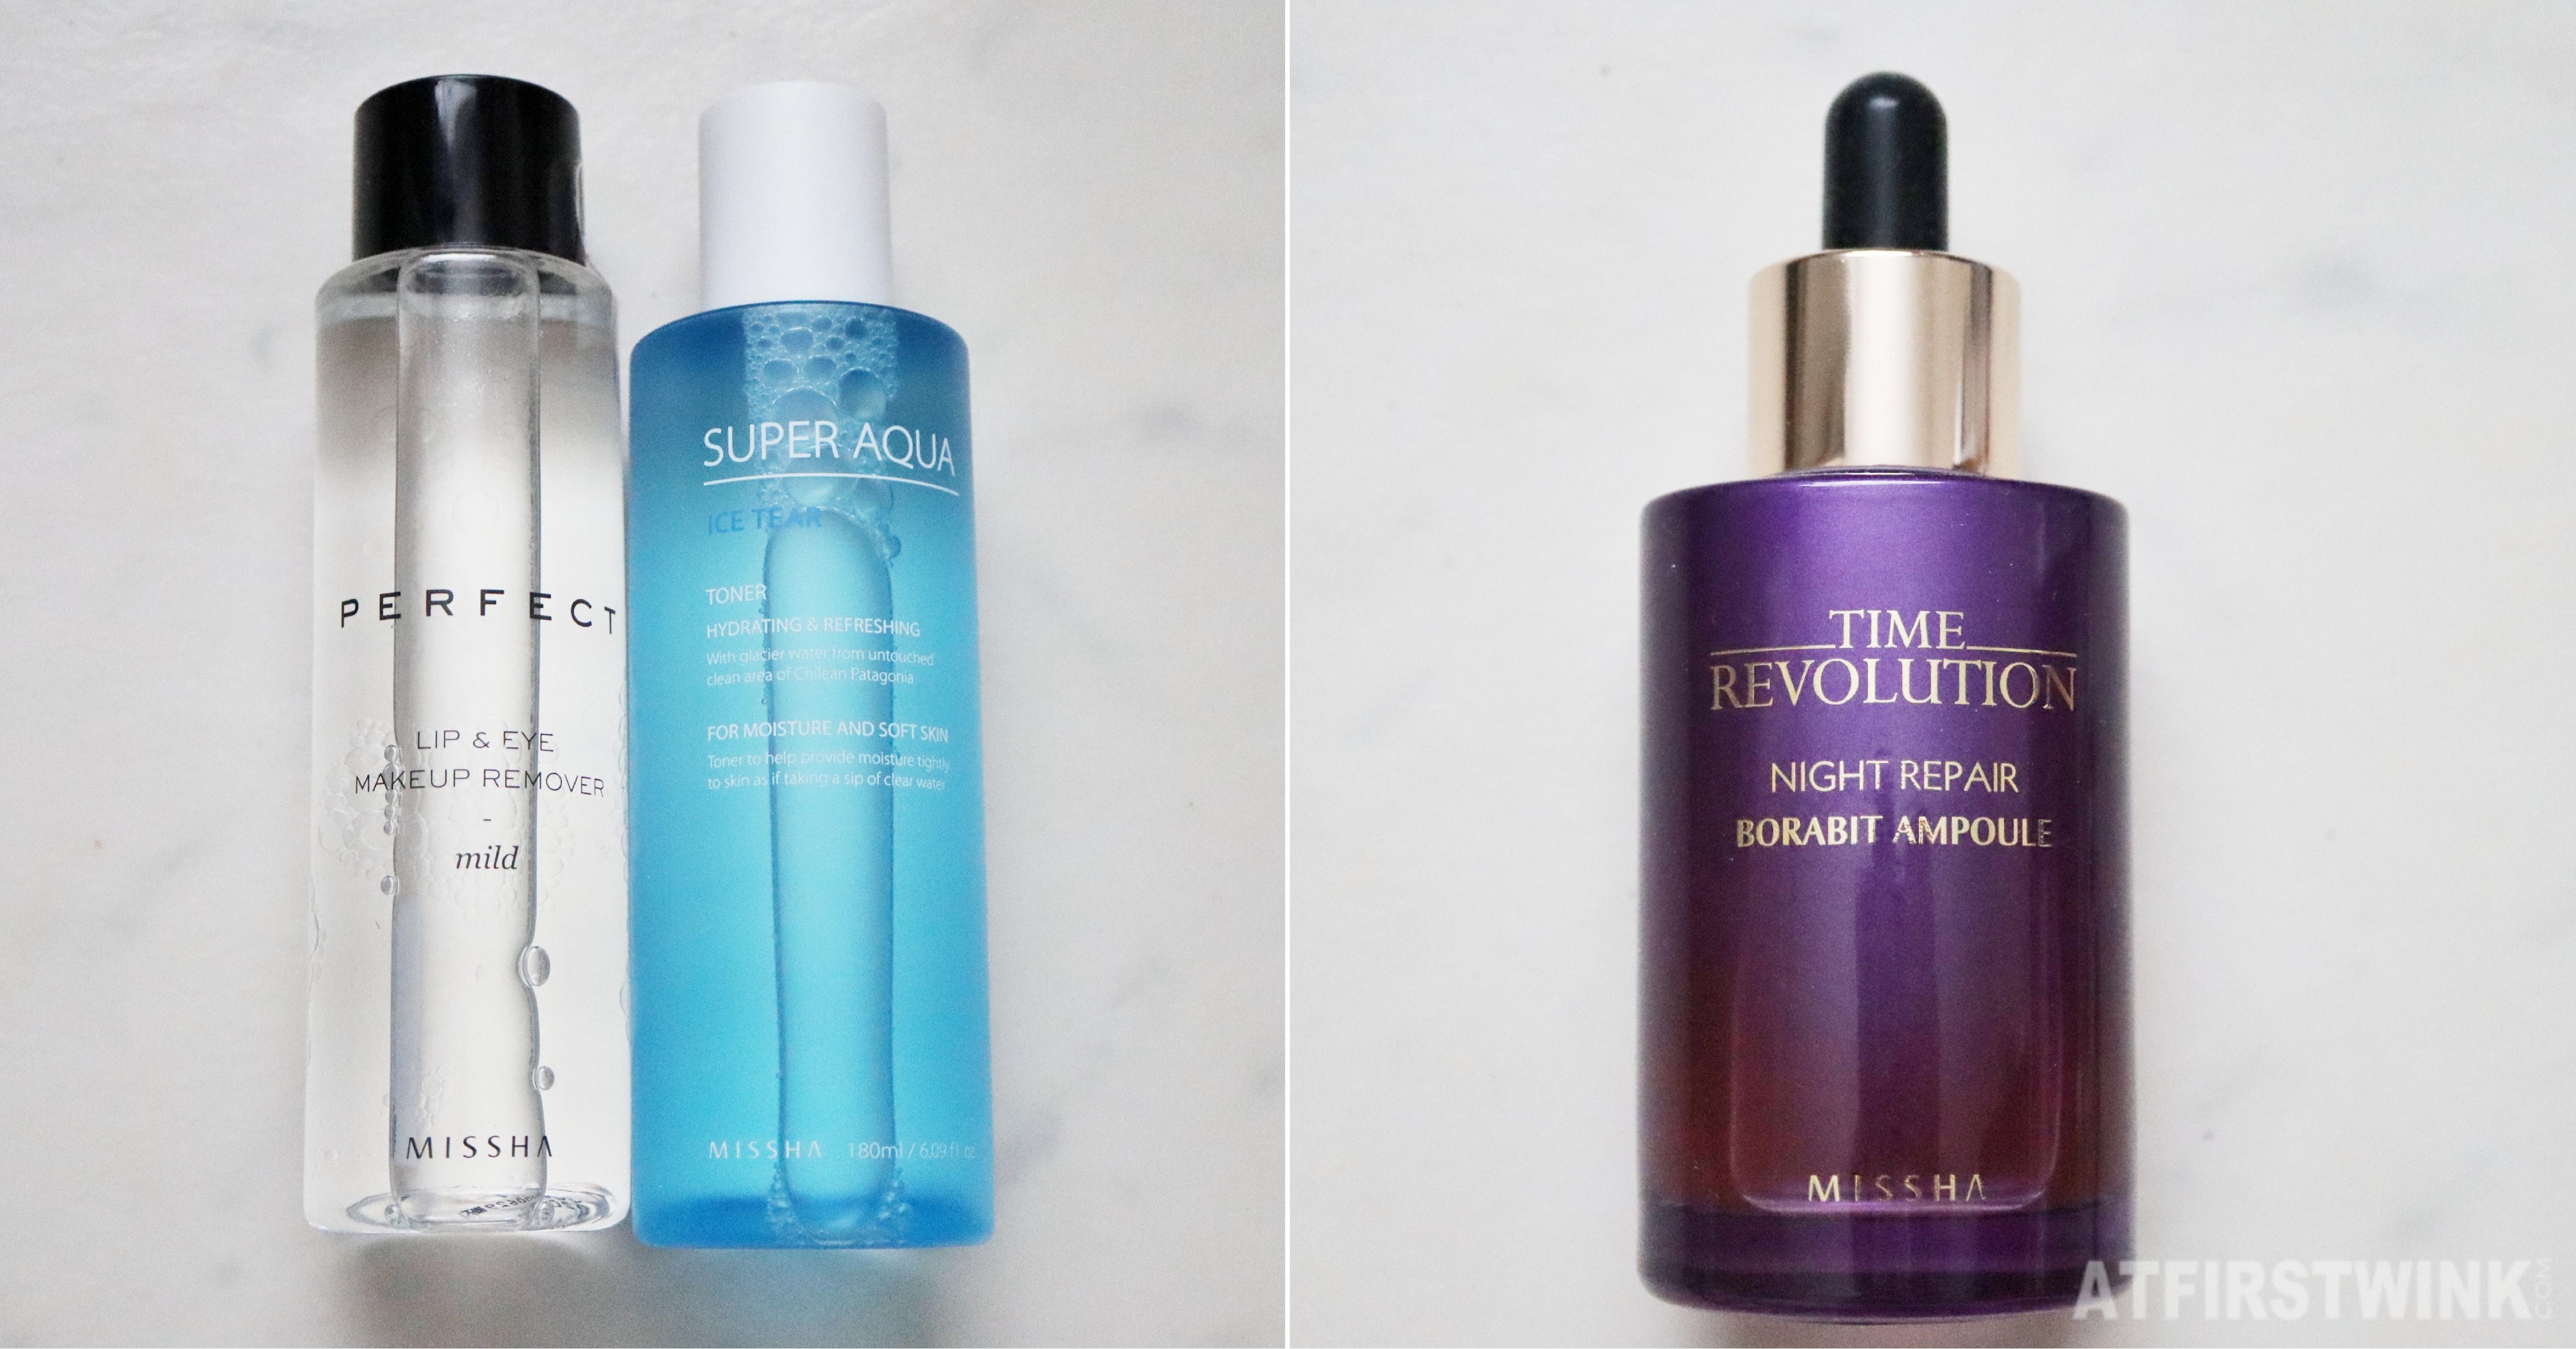 Missha time revolution night repair borabit ampoule super aqua ice tear toner perfect lip and eye remover